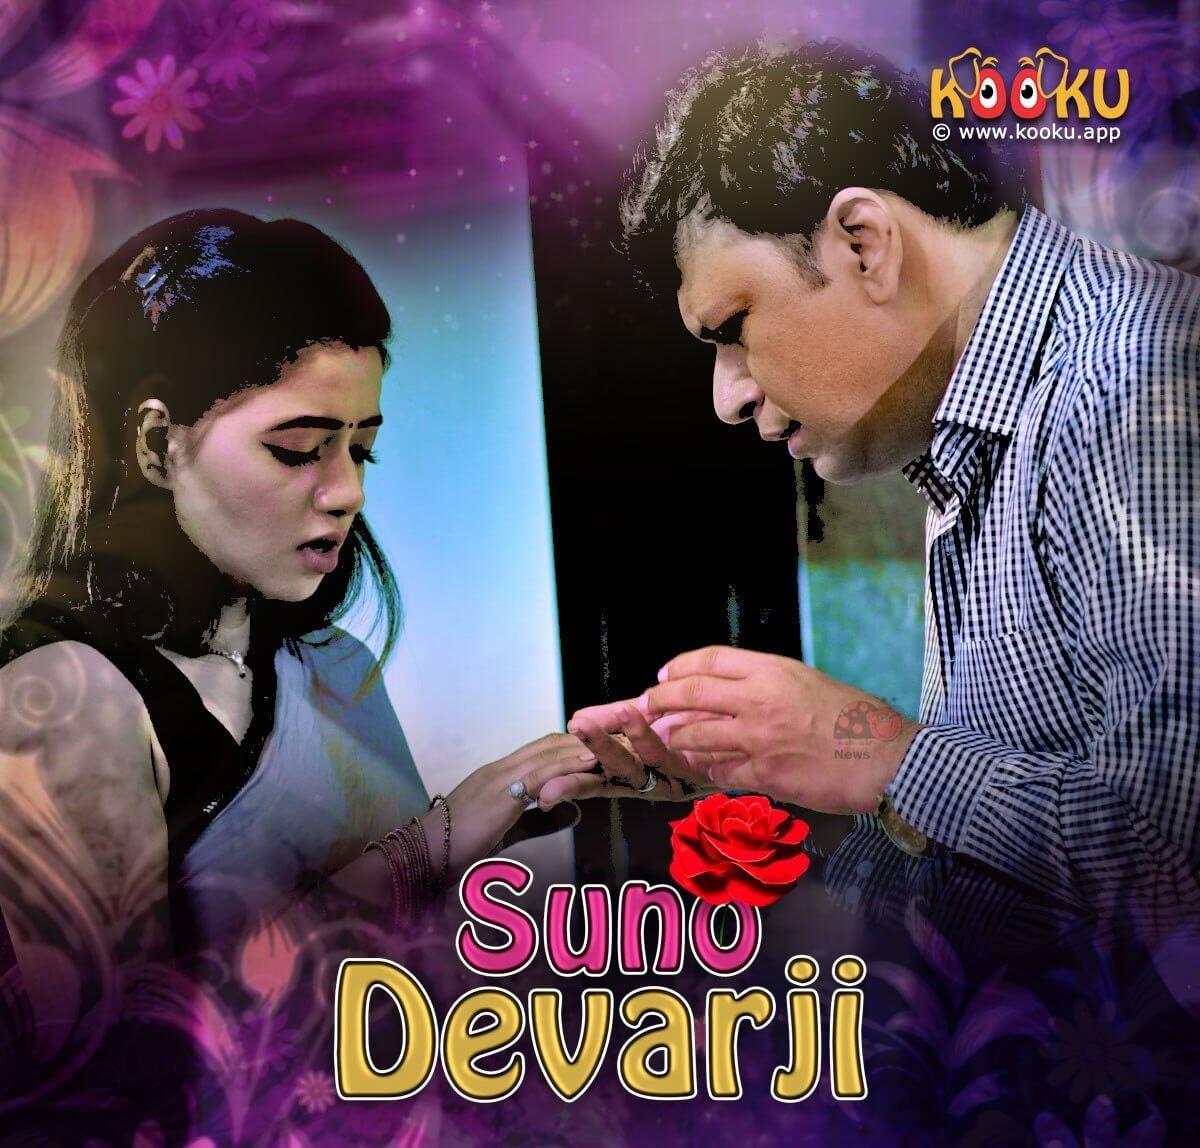 Suno Devar Ji kooku